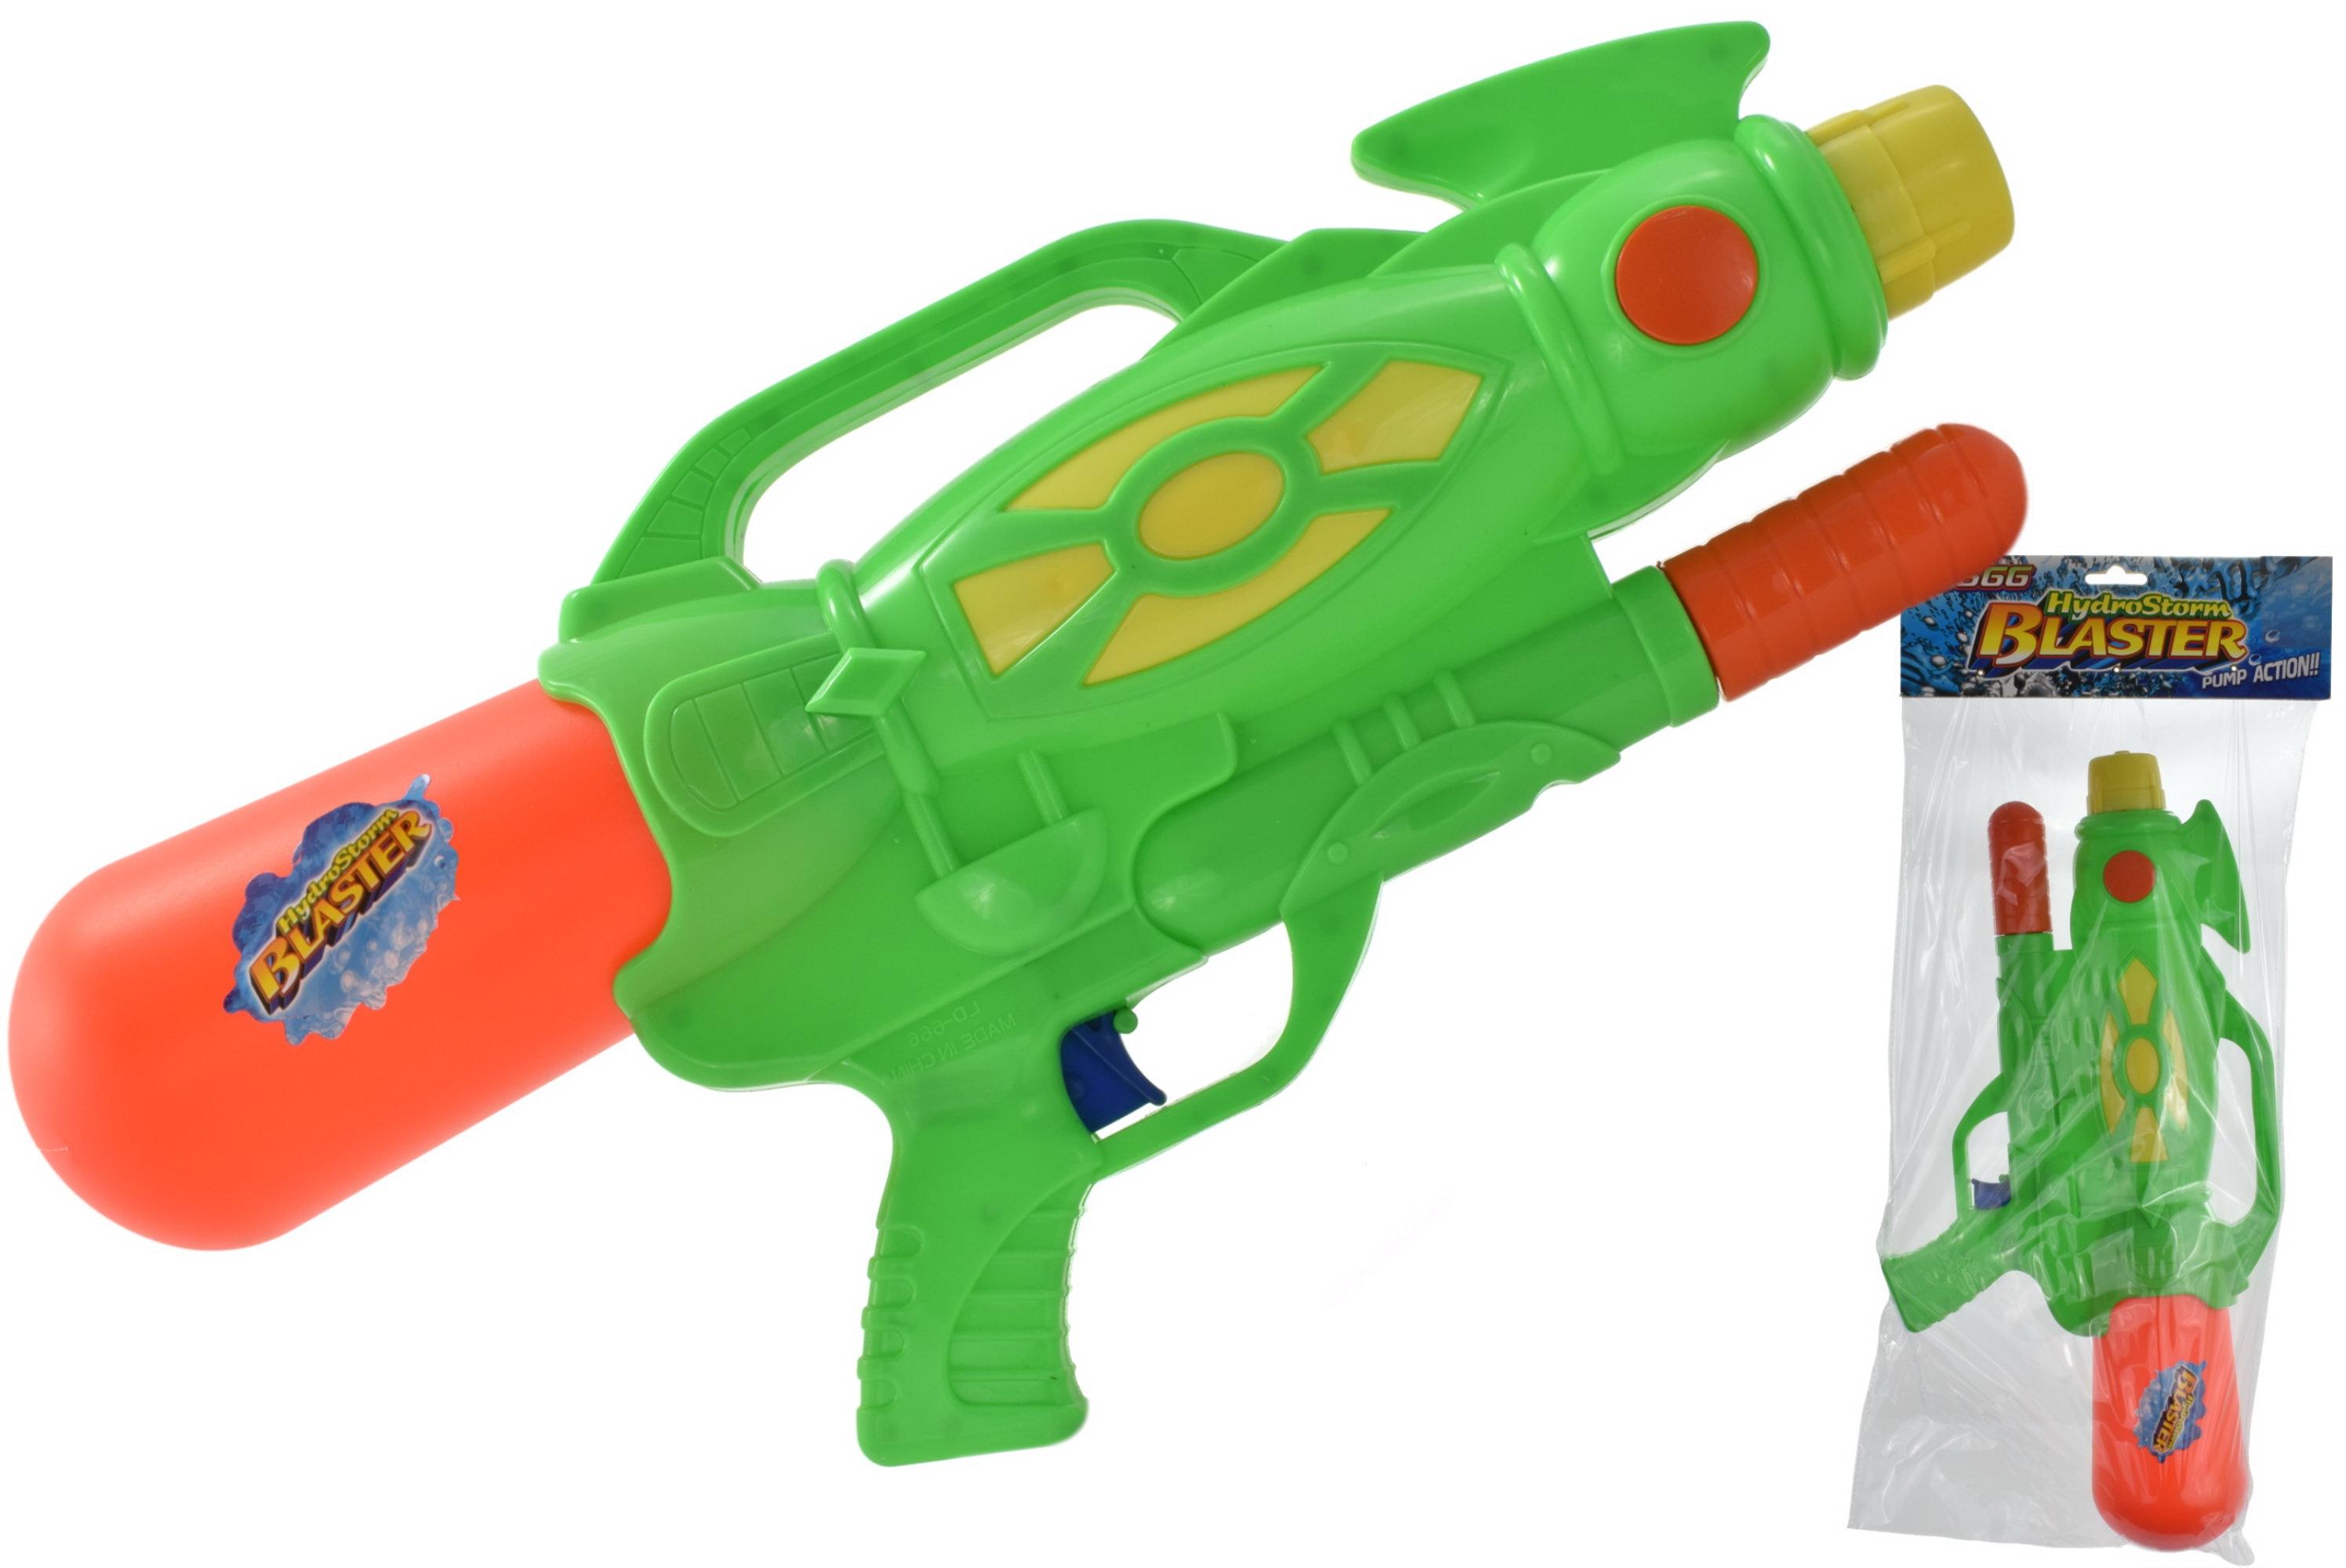 48cm Watergun In Pvc Bag Header